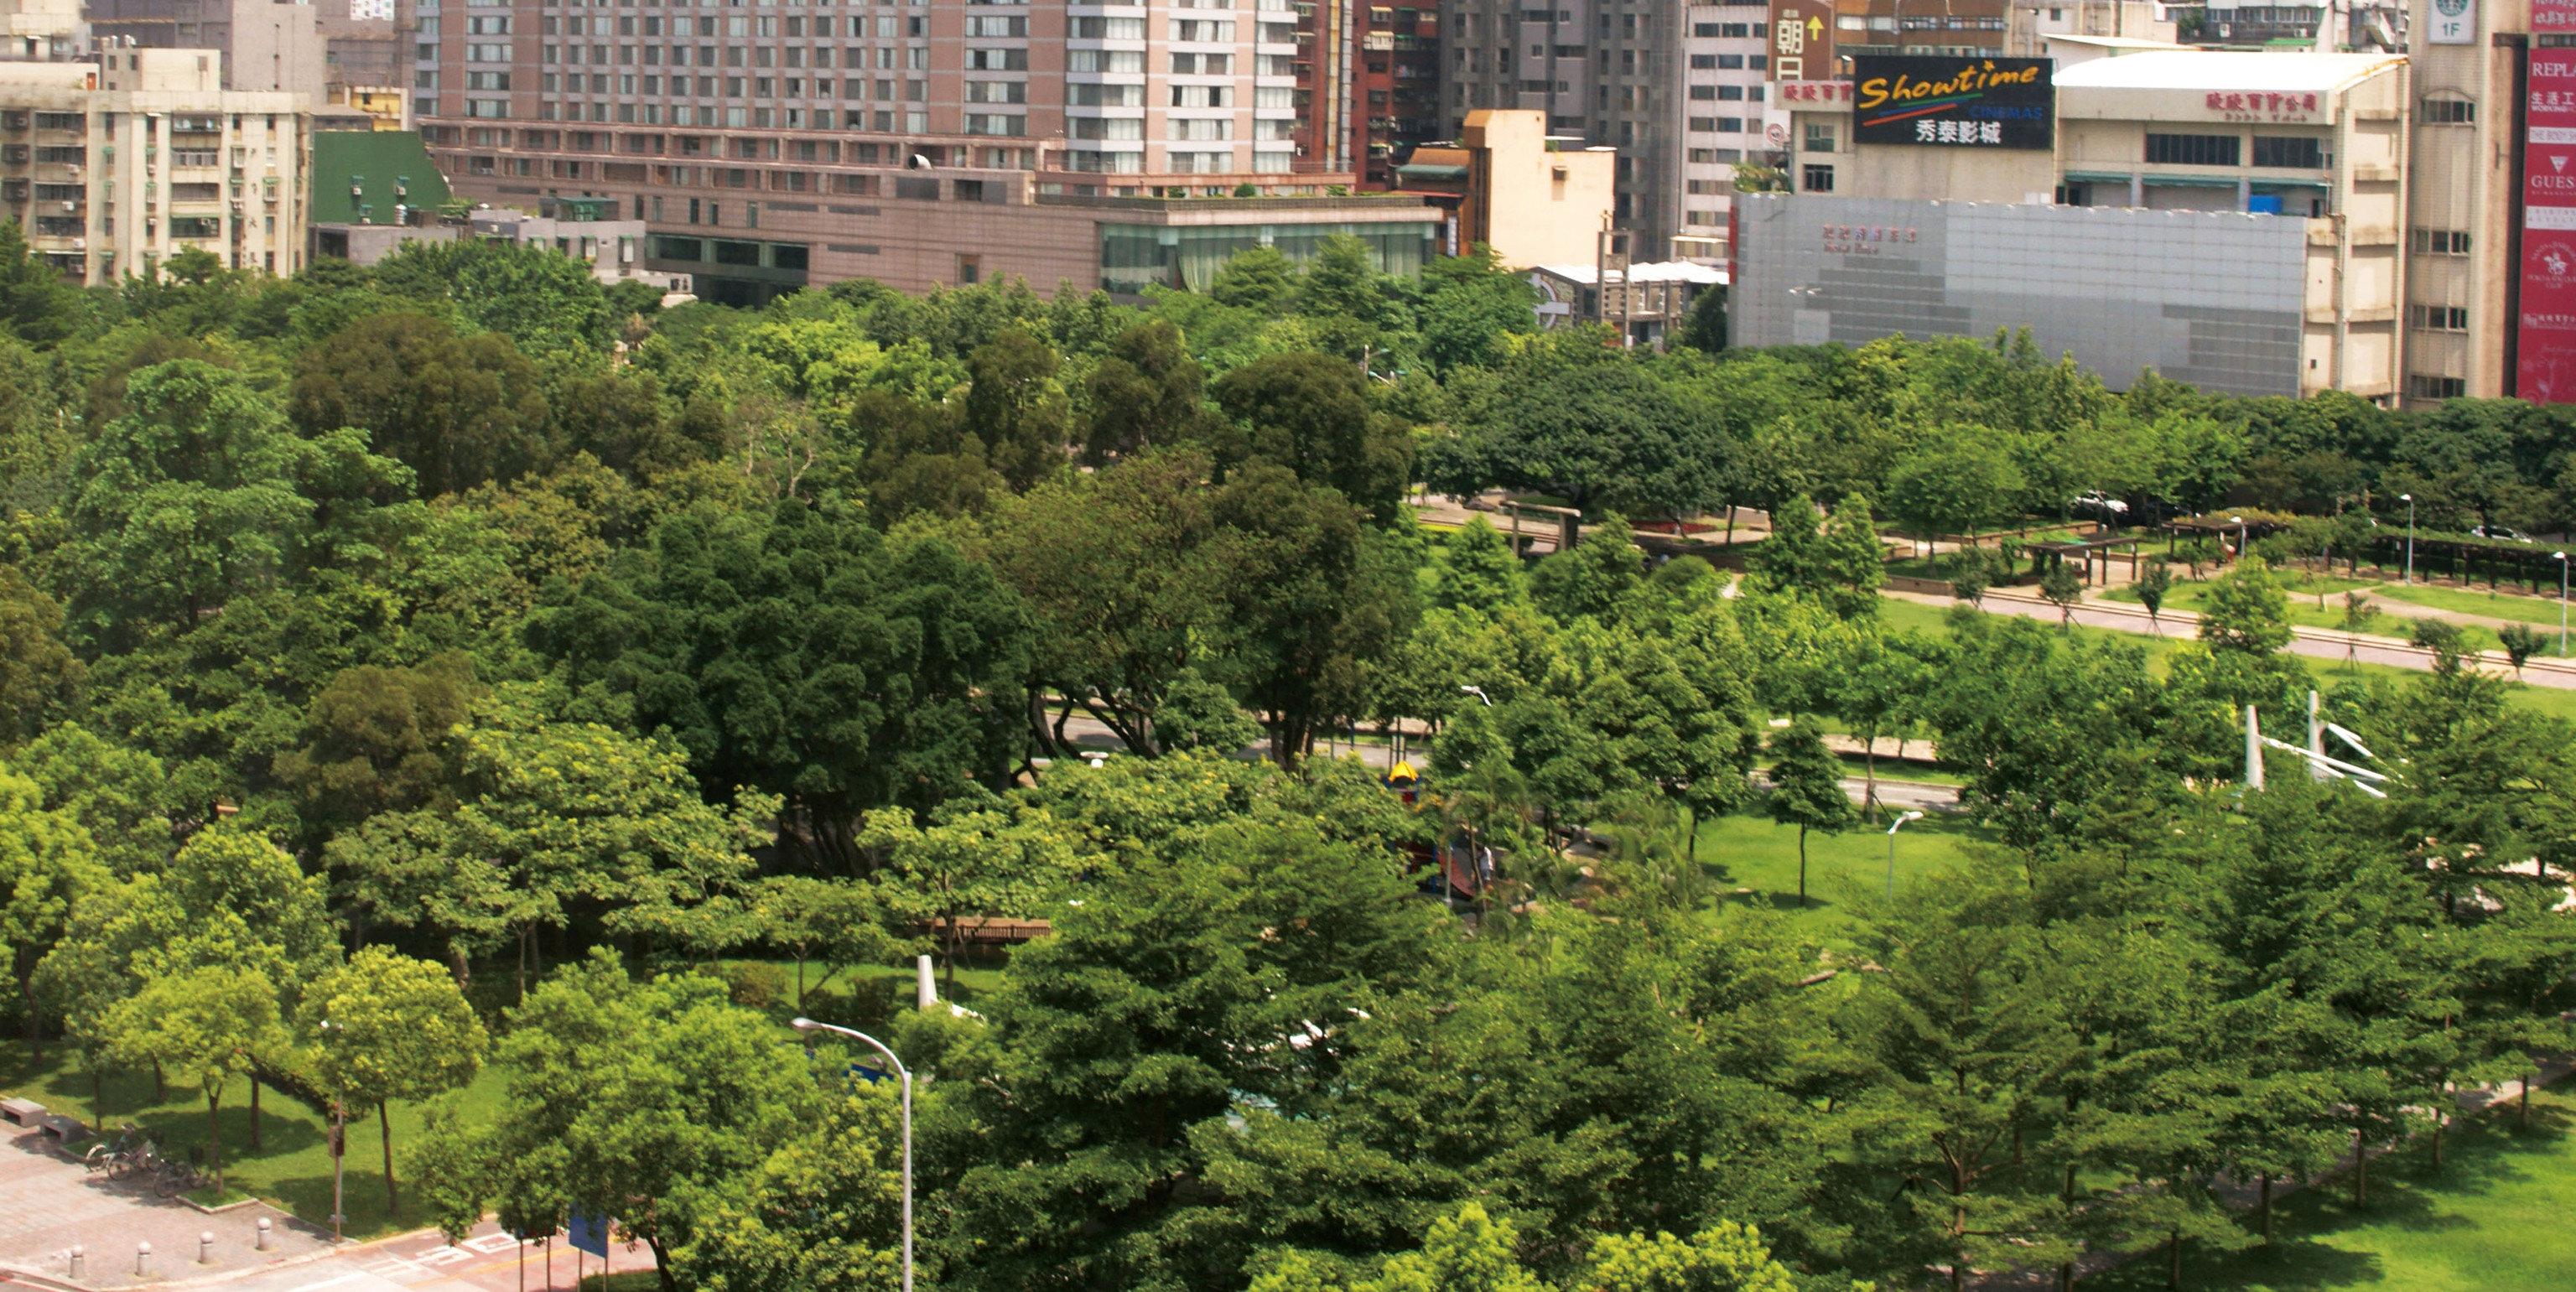 tree residential area neighbourhood City Town Garden suburb